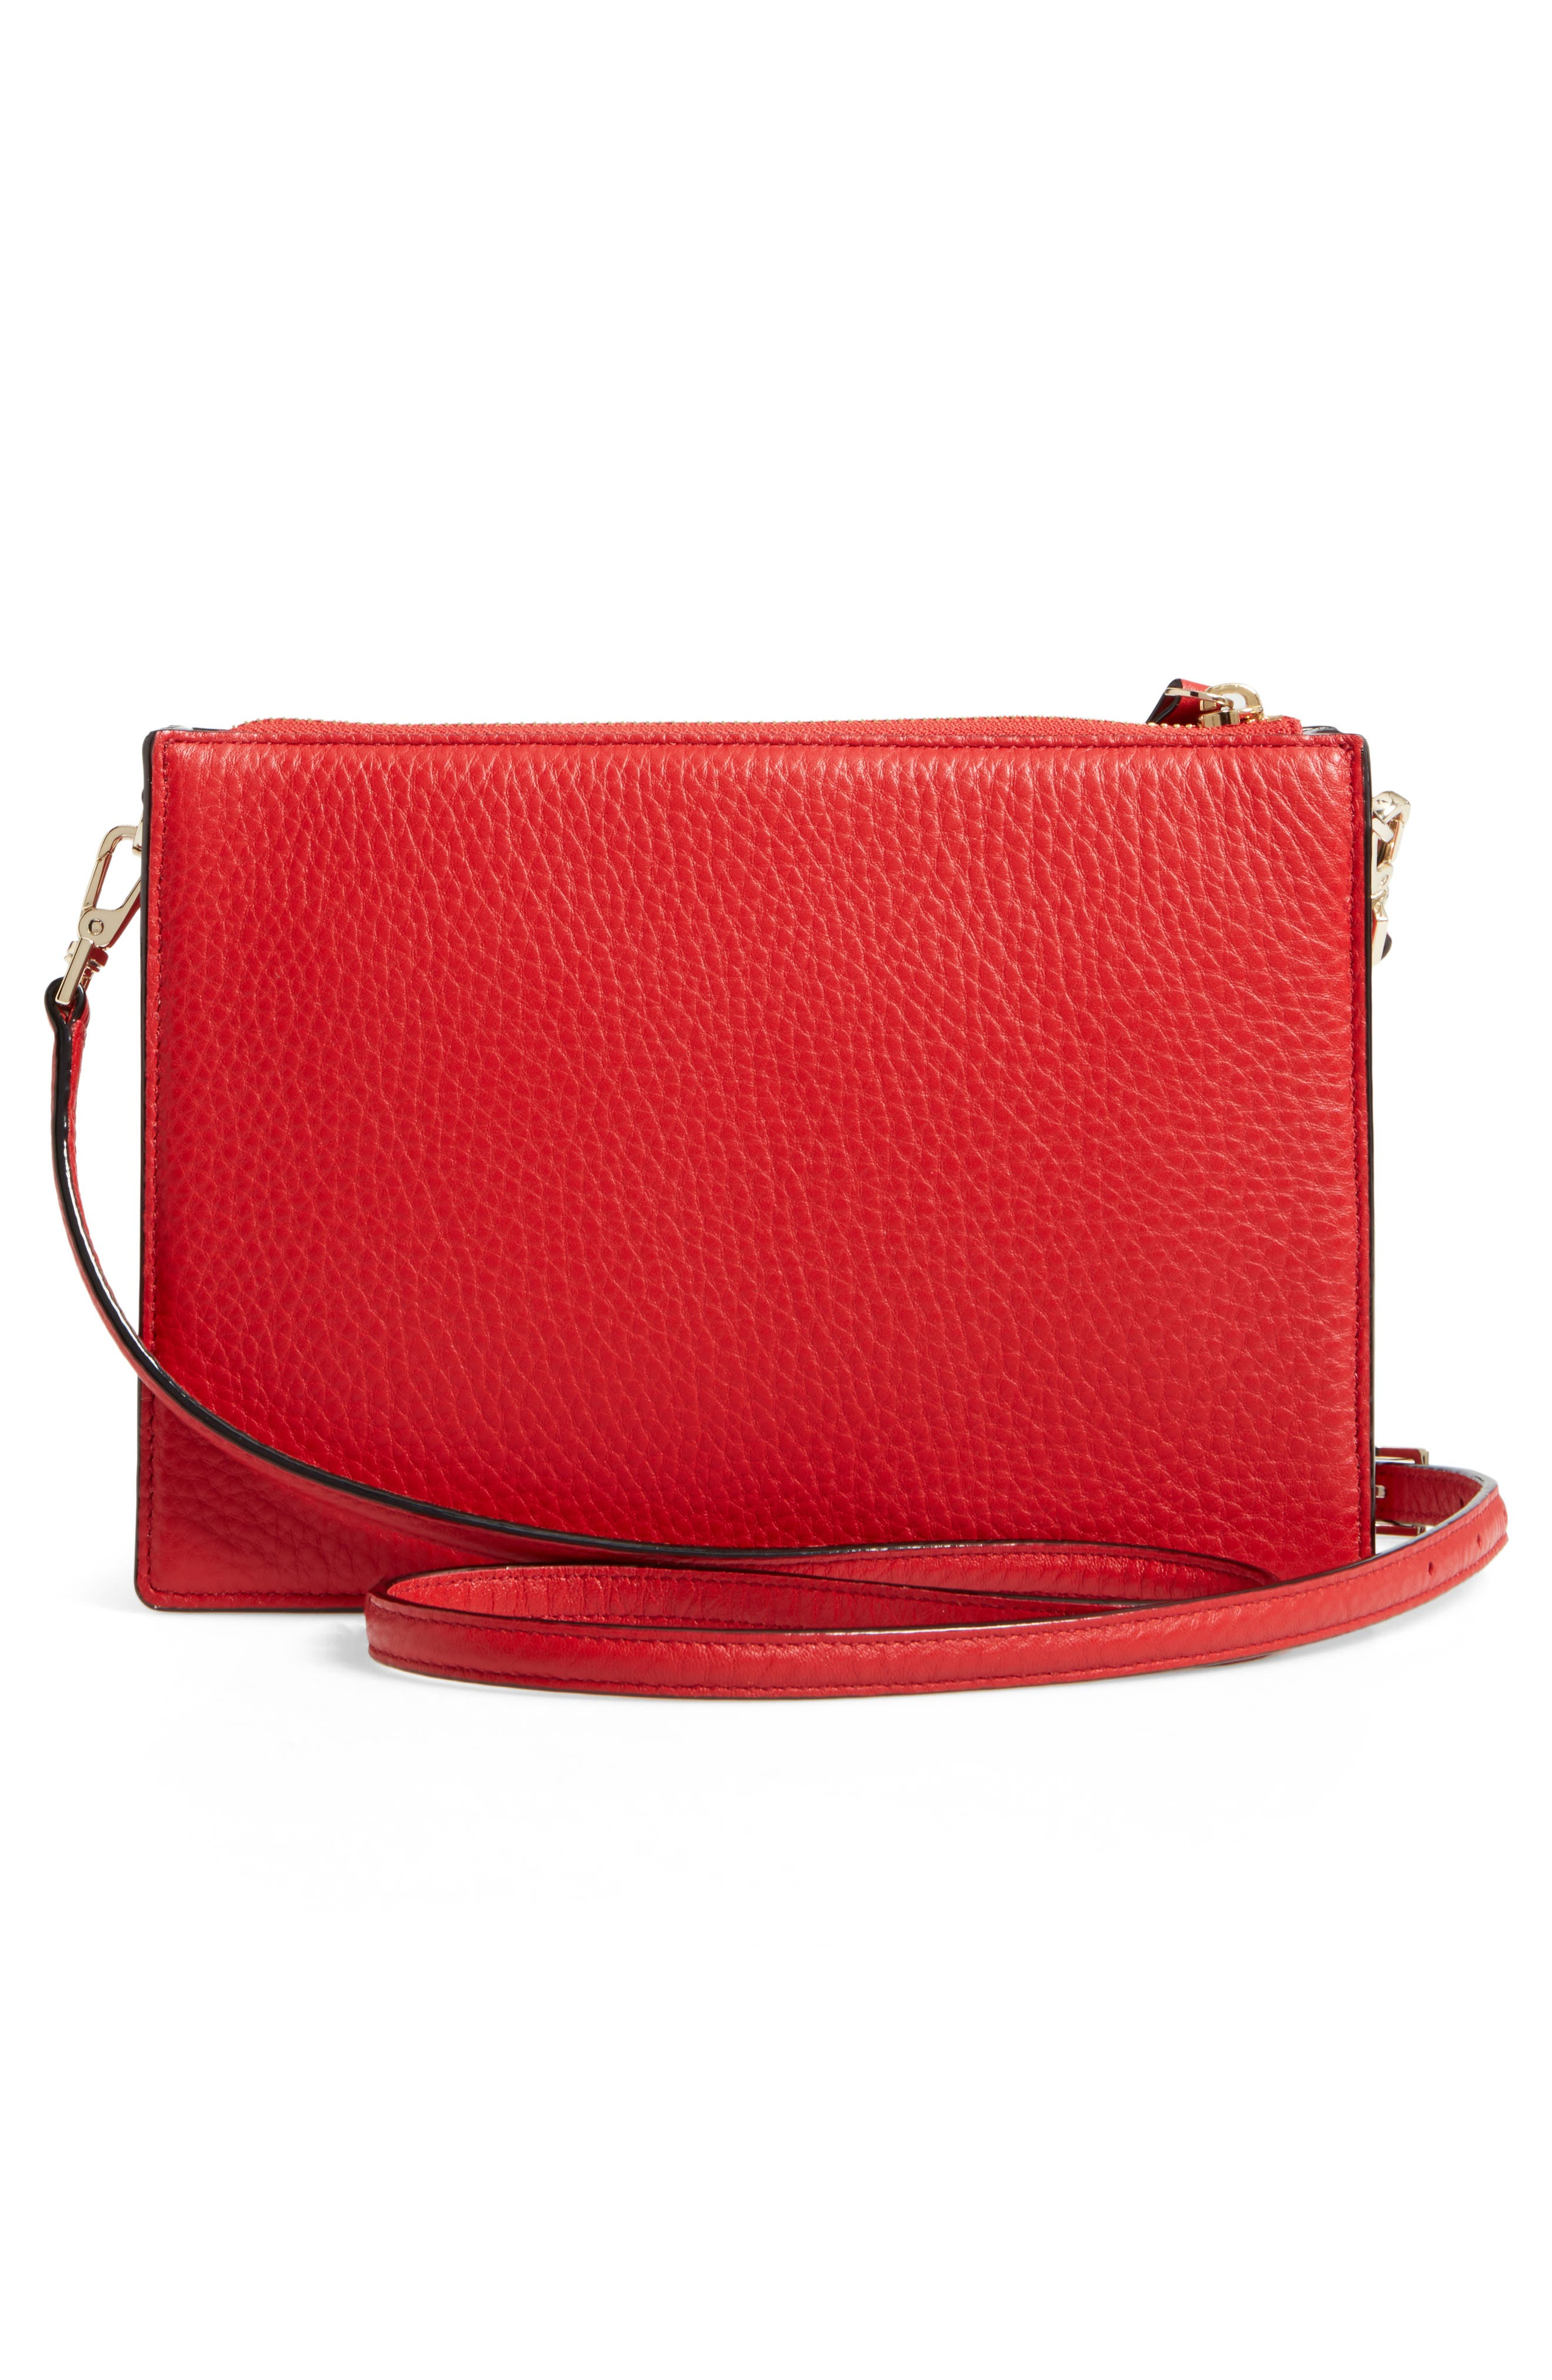 steward street clarise leather shoulder bag,                             Alternate thumbnail 9, color,